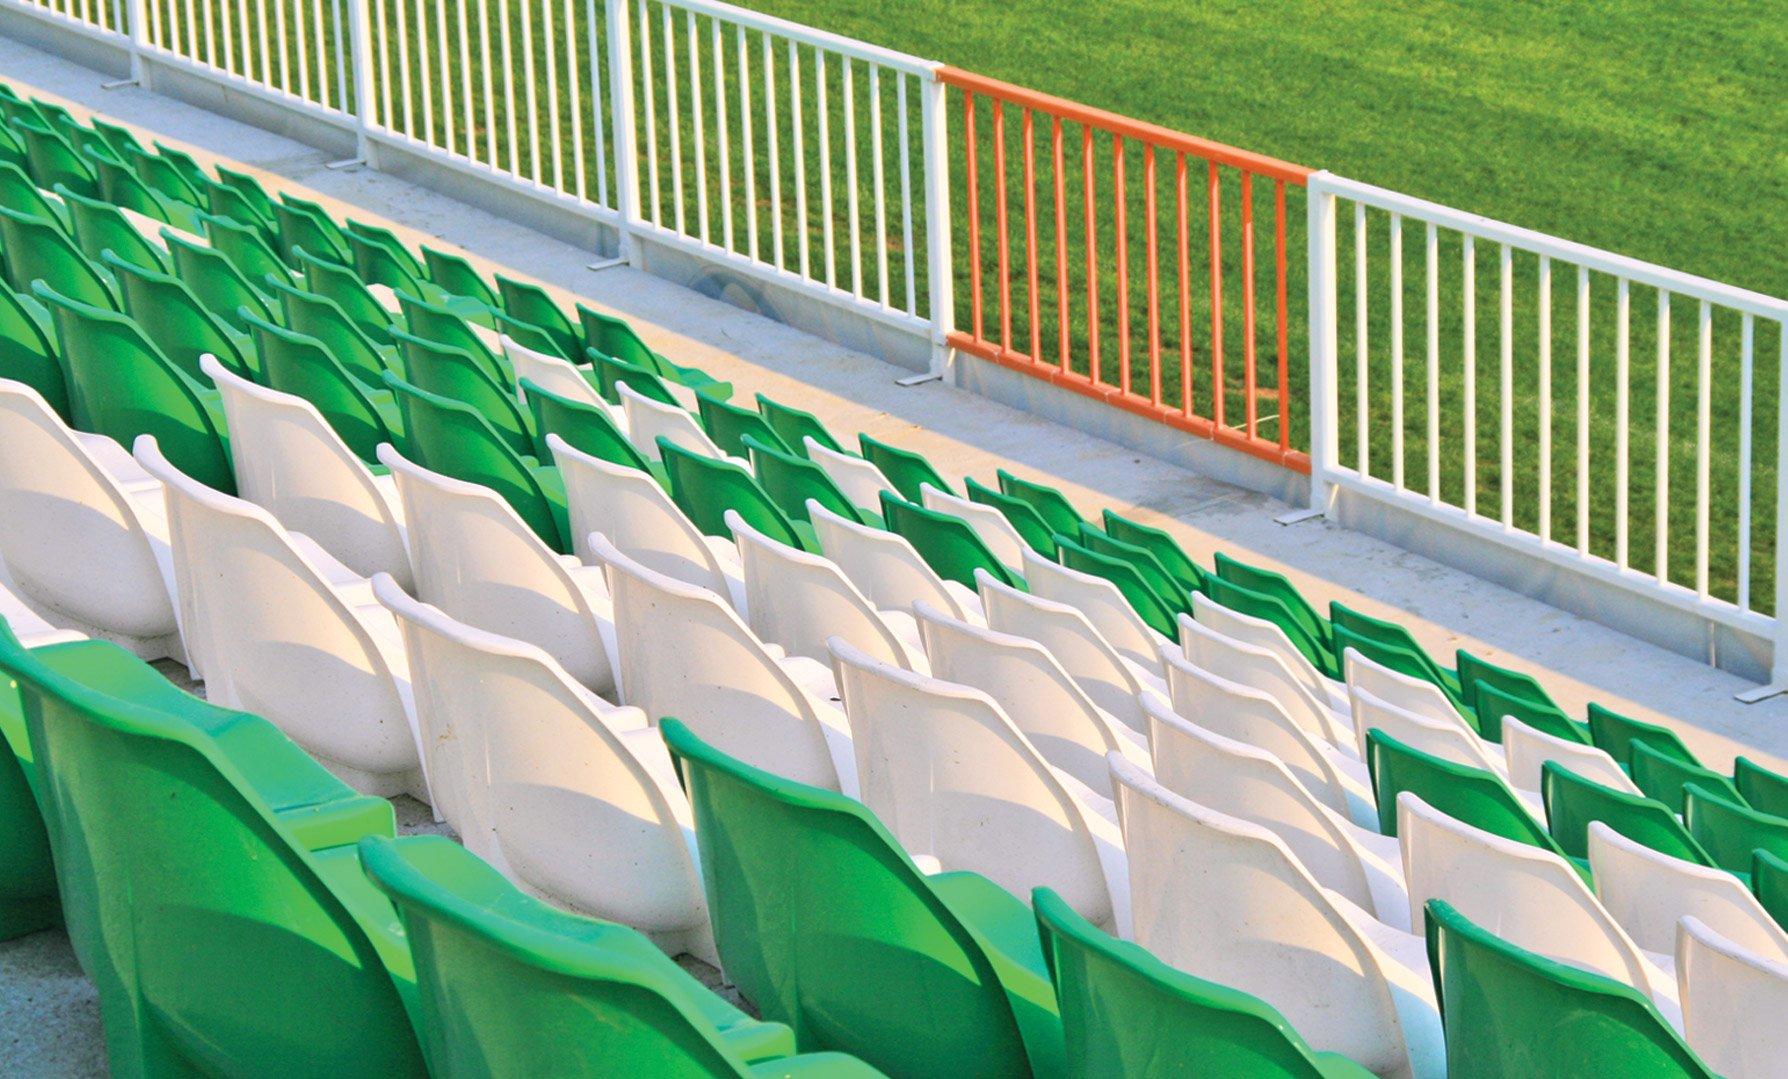 stadiumchairs06